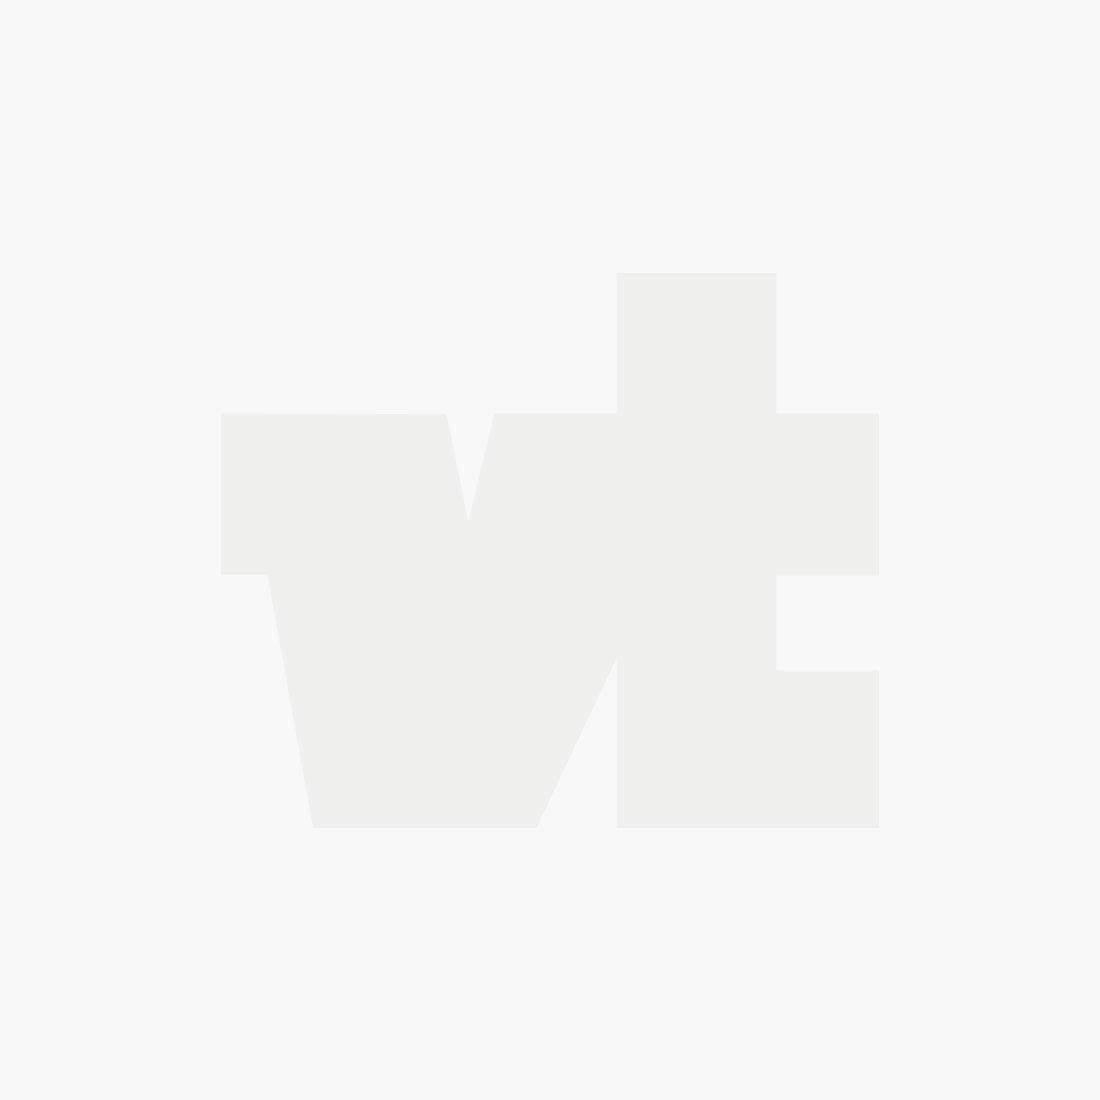 Theq run black dk grey